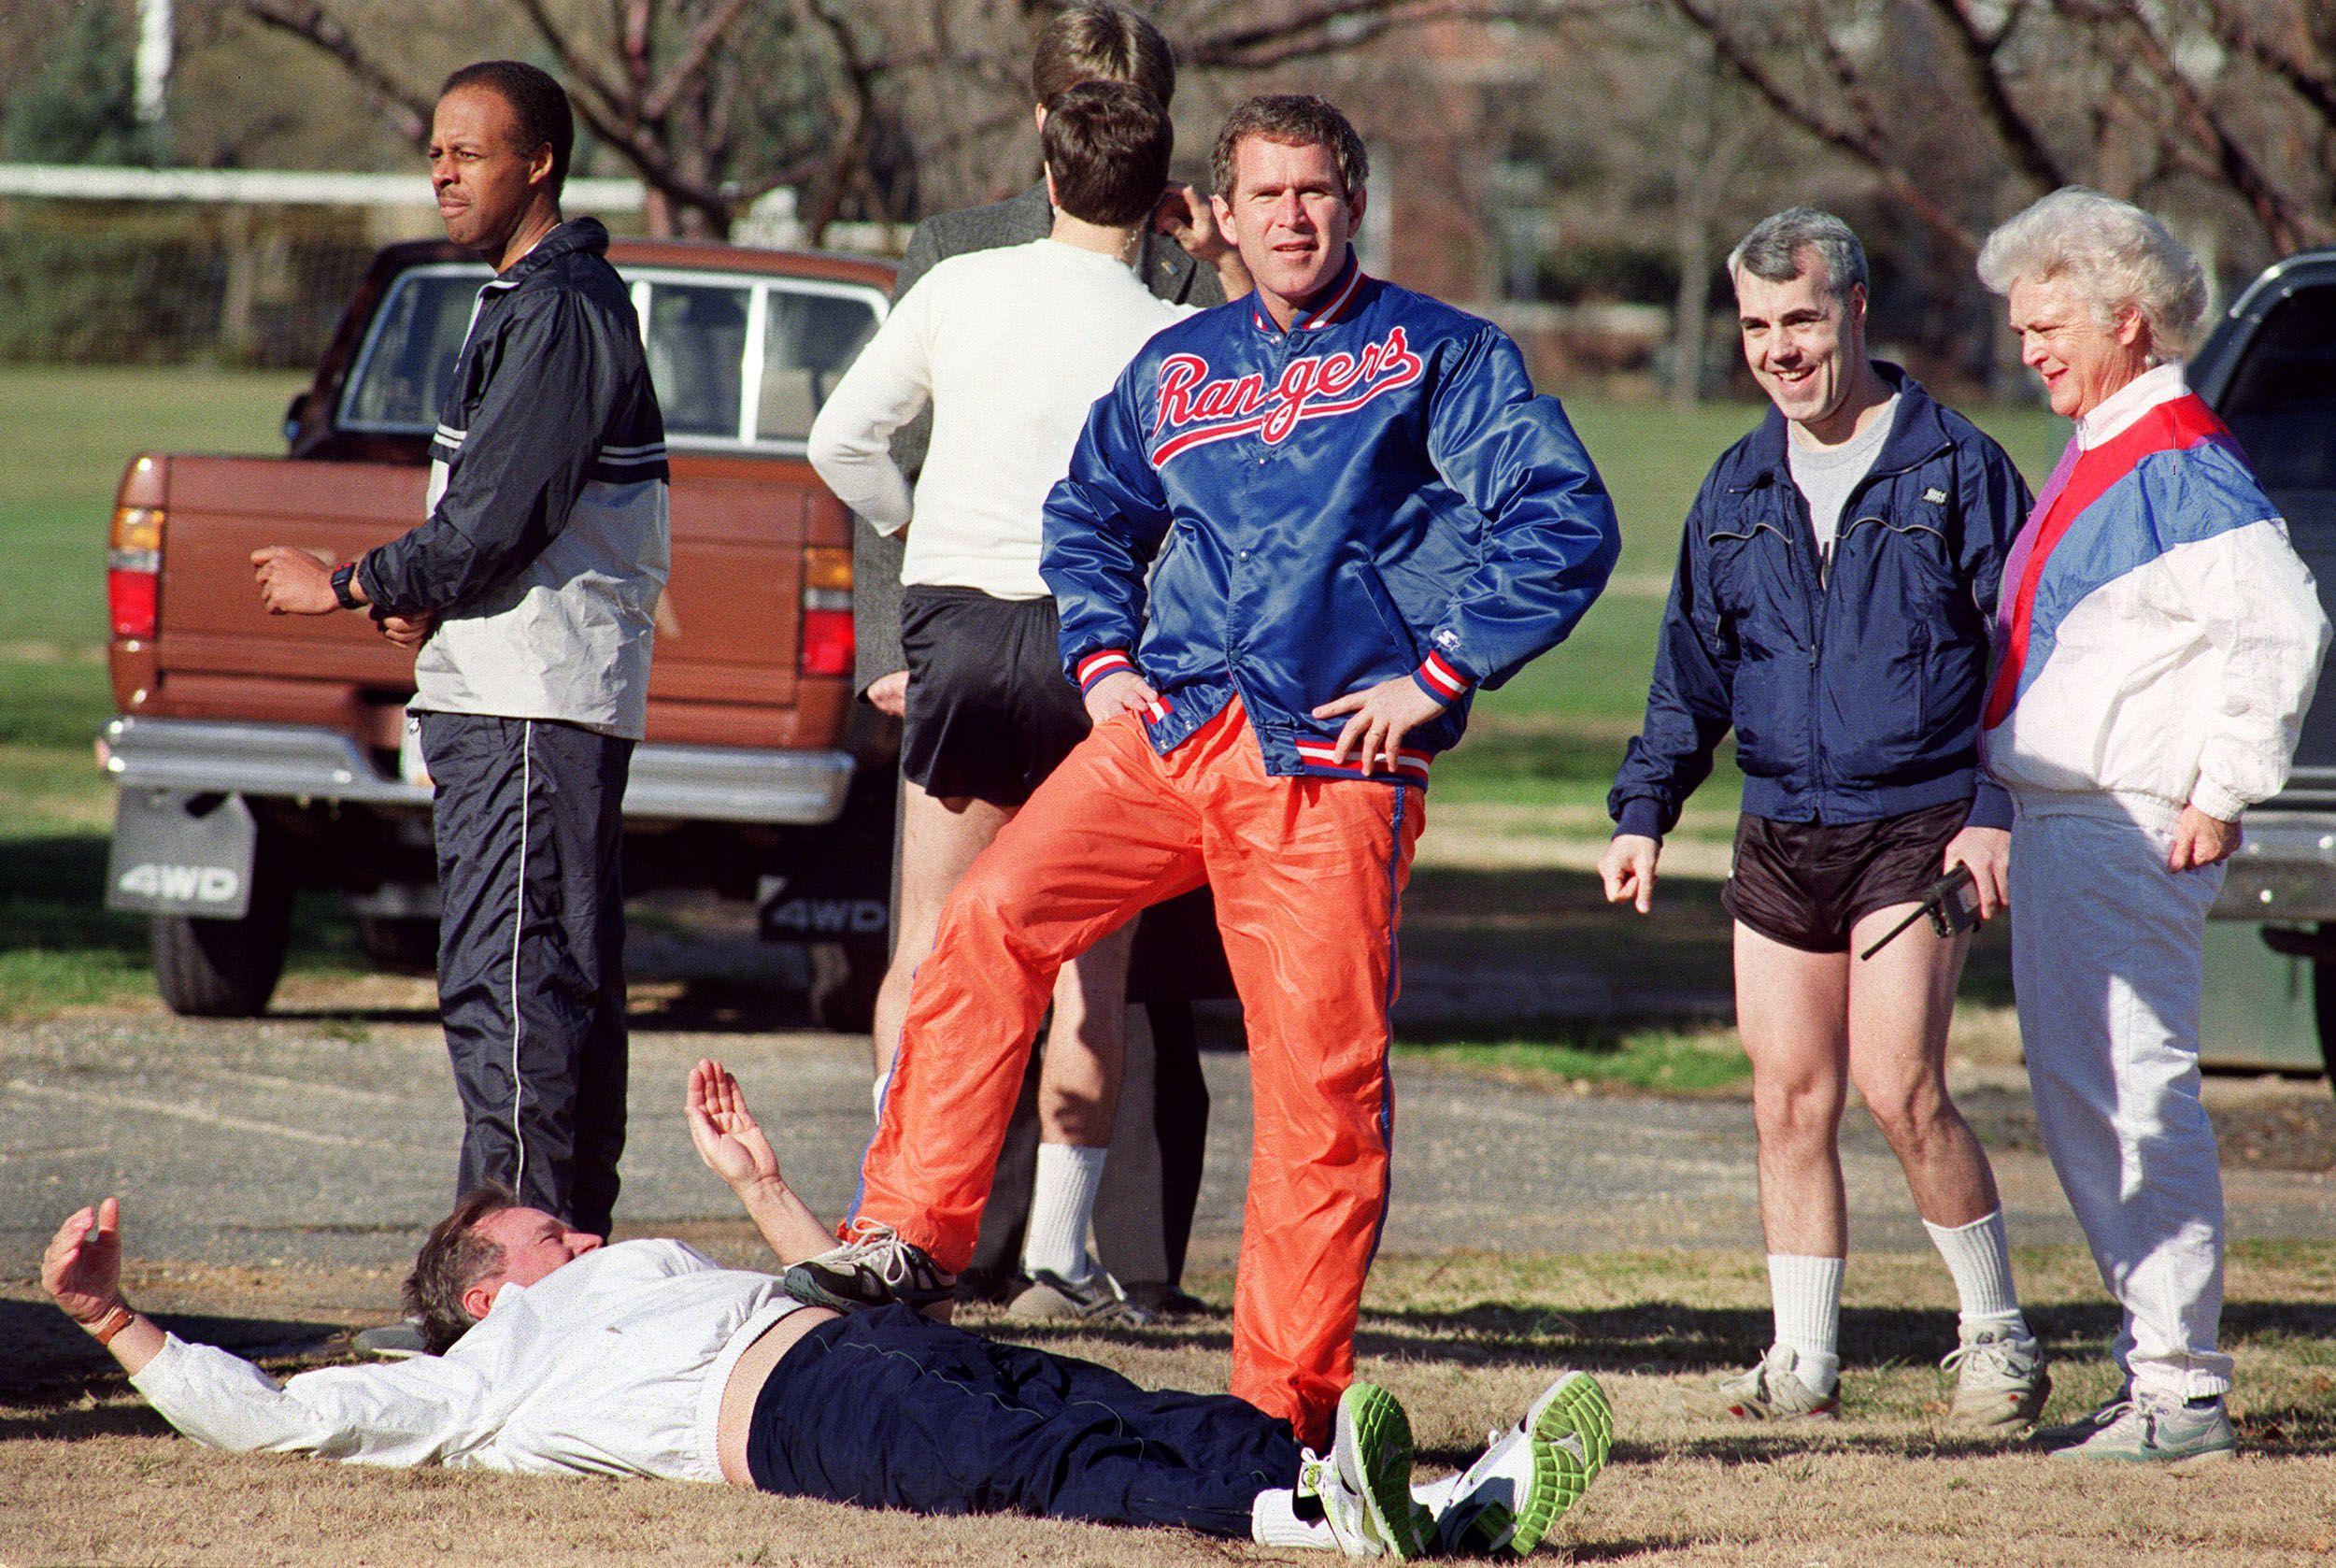 Secret Service agents with George H.W. Bush, George W. Bush, and Barbara Bush 1990